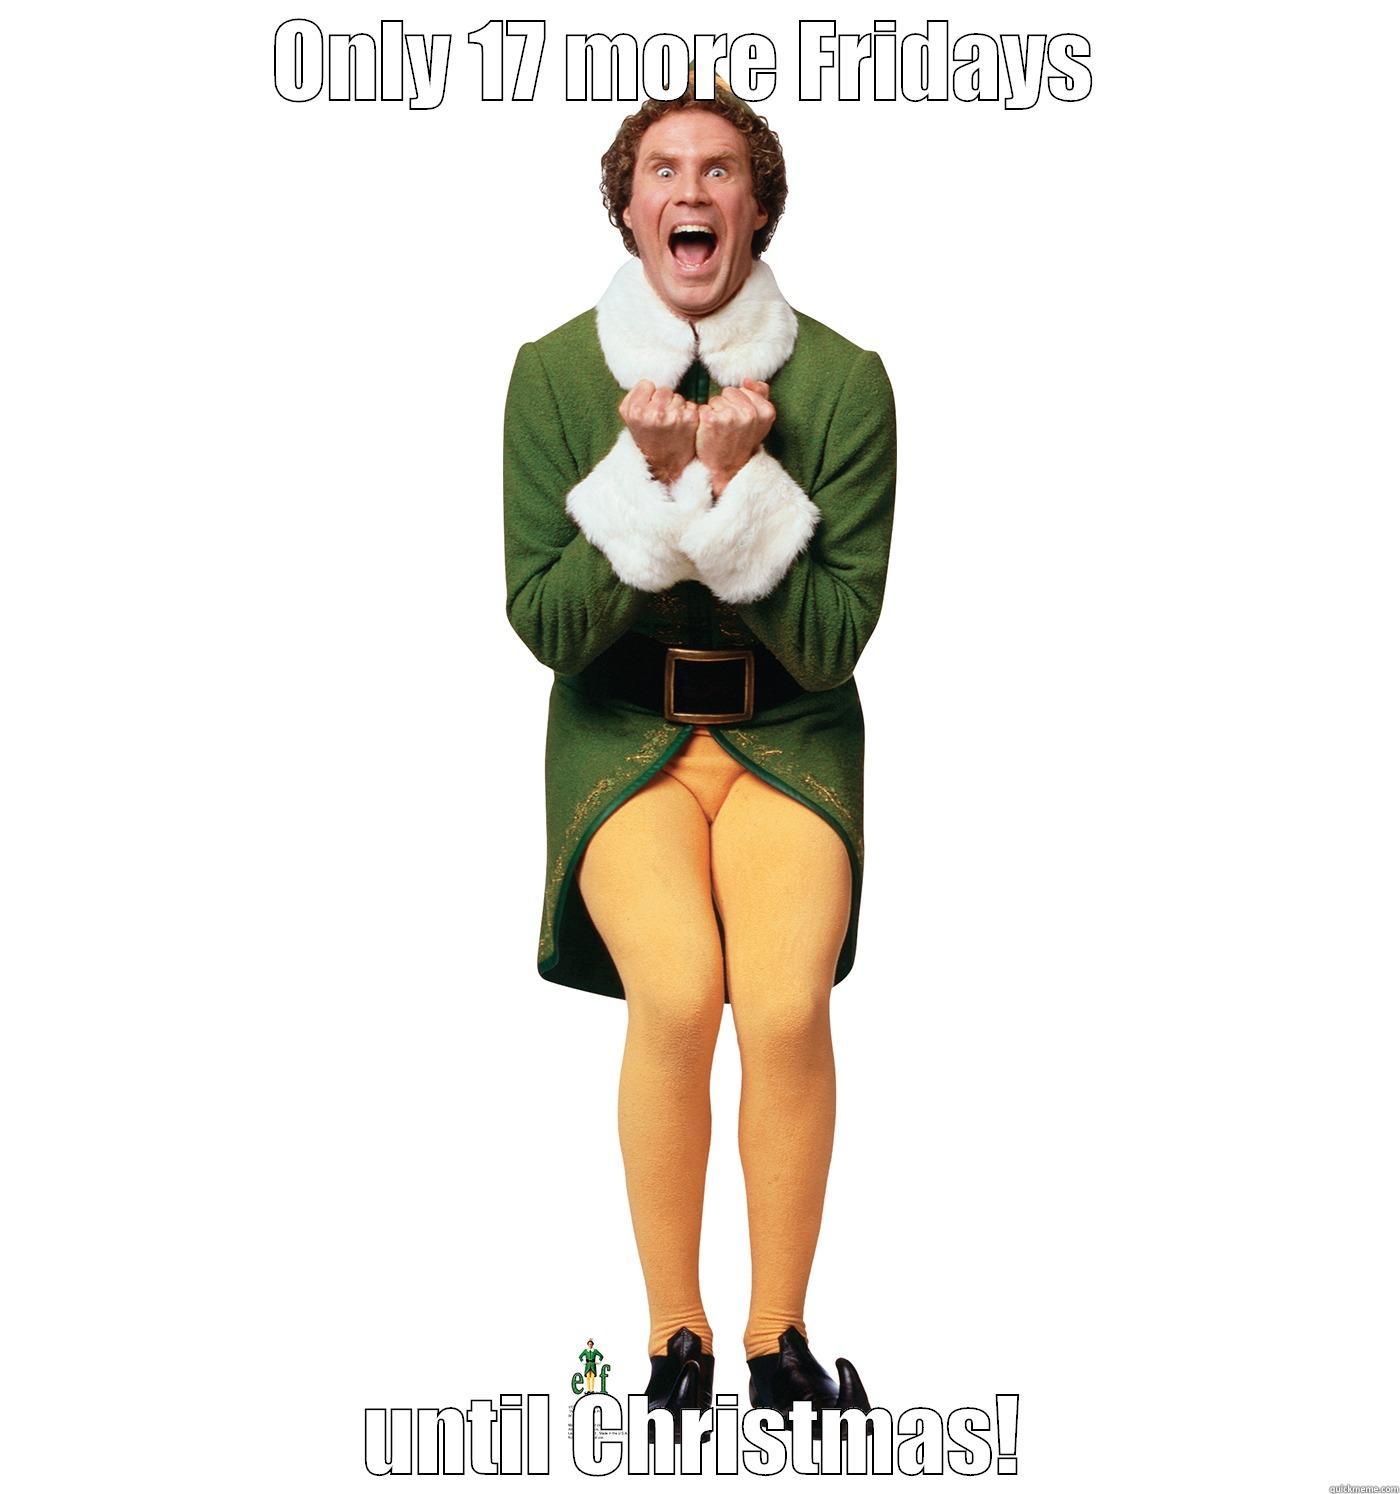 Friday's until Christmas - quickmeme